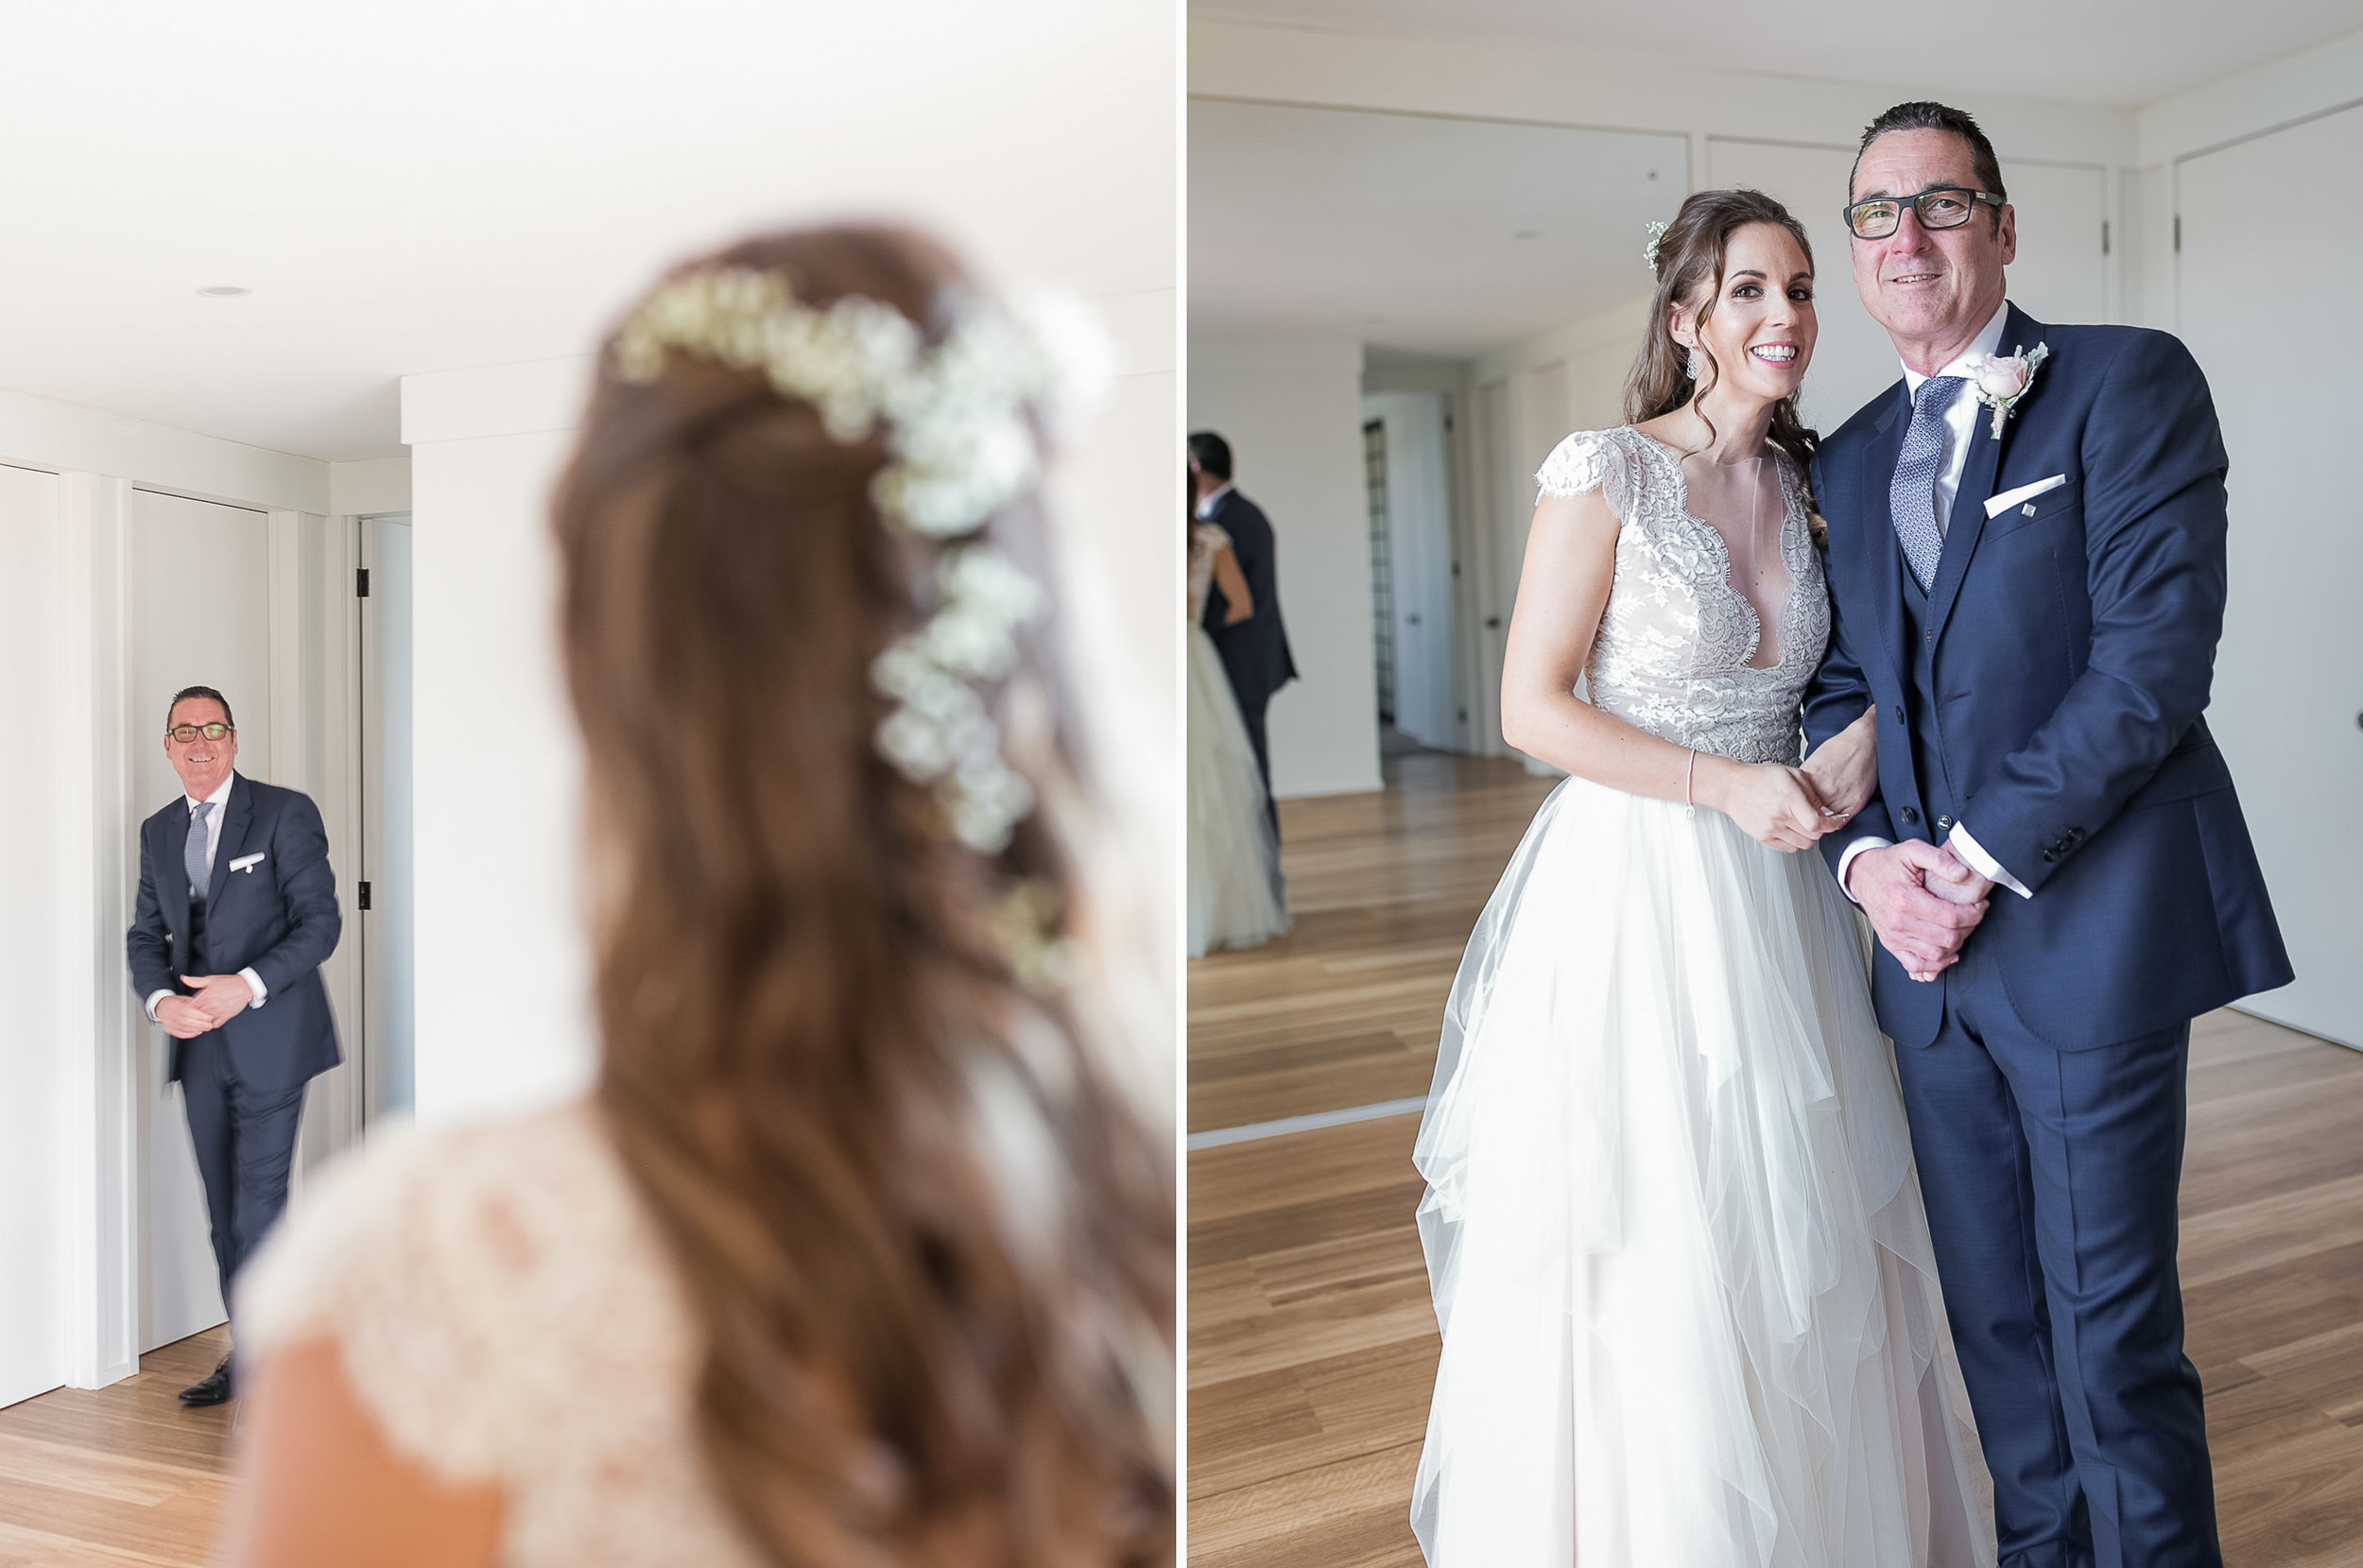 True North Photography_Boomerang Farm_Amy and Michael_Getting ready_Wedding Dress_Gold Coast Wedding_Father of the bride.jpg